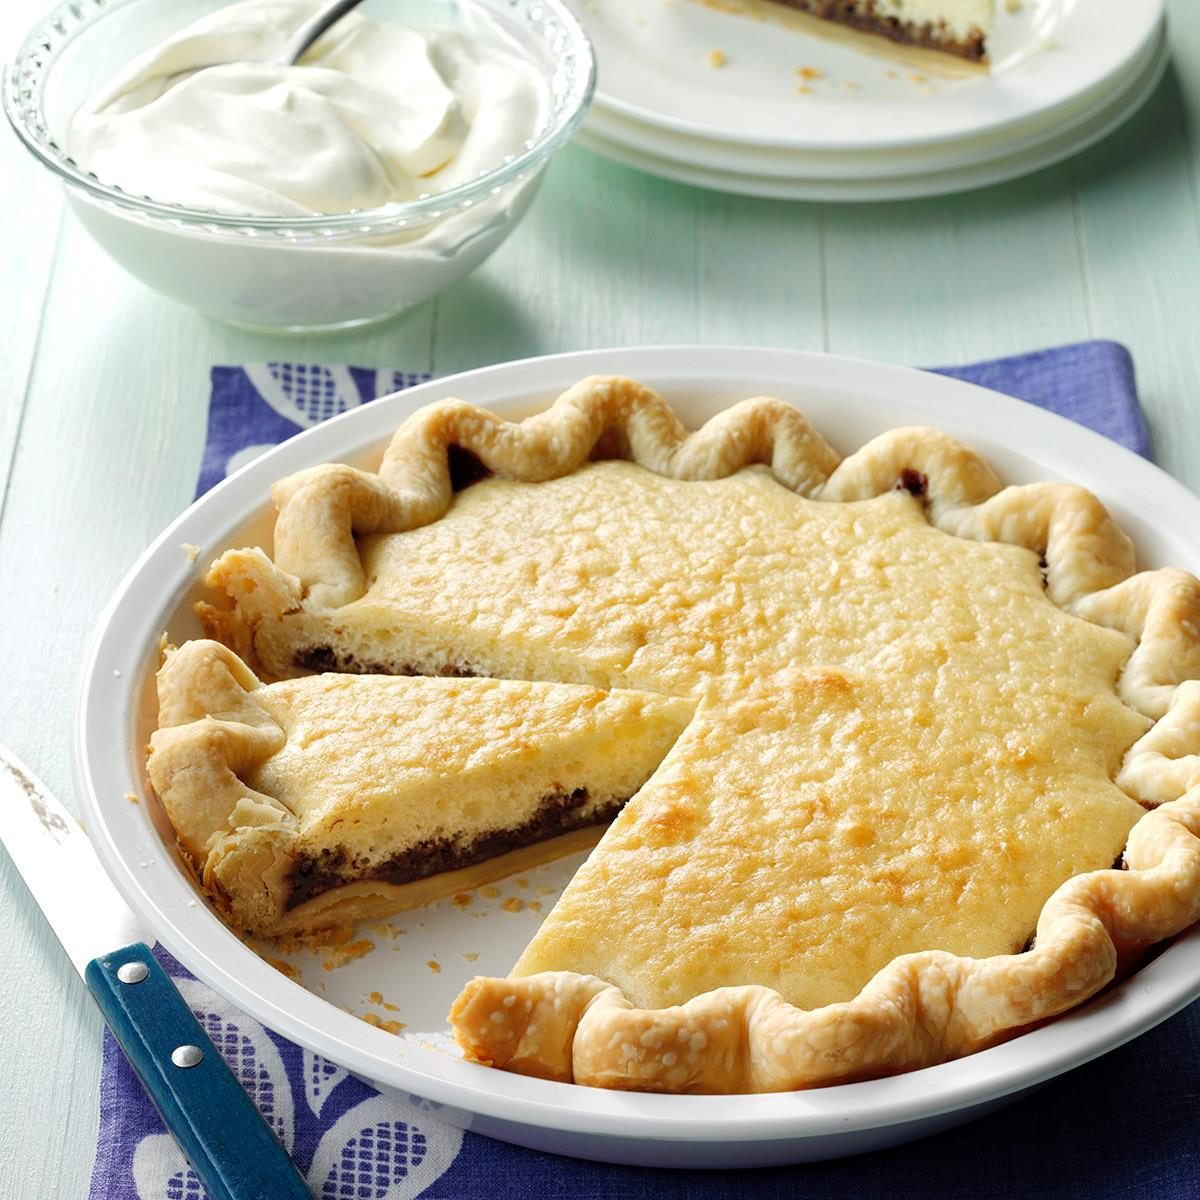 Grandma's Best Pastry Recipes